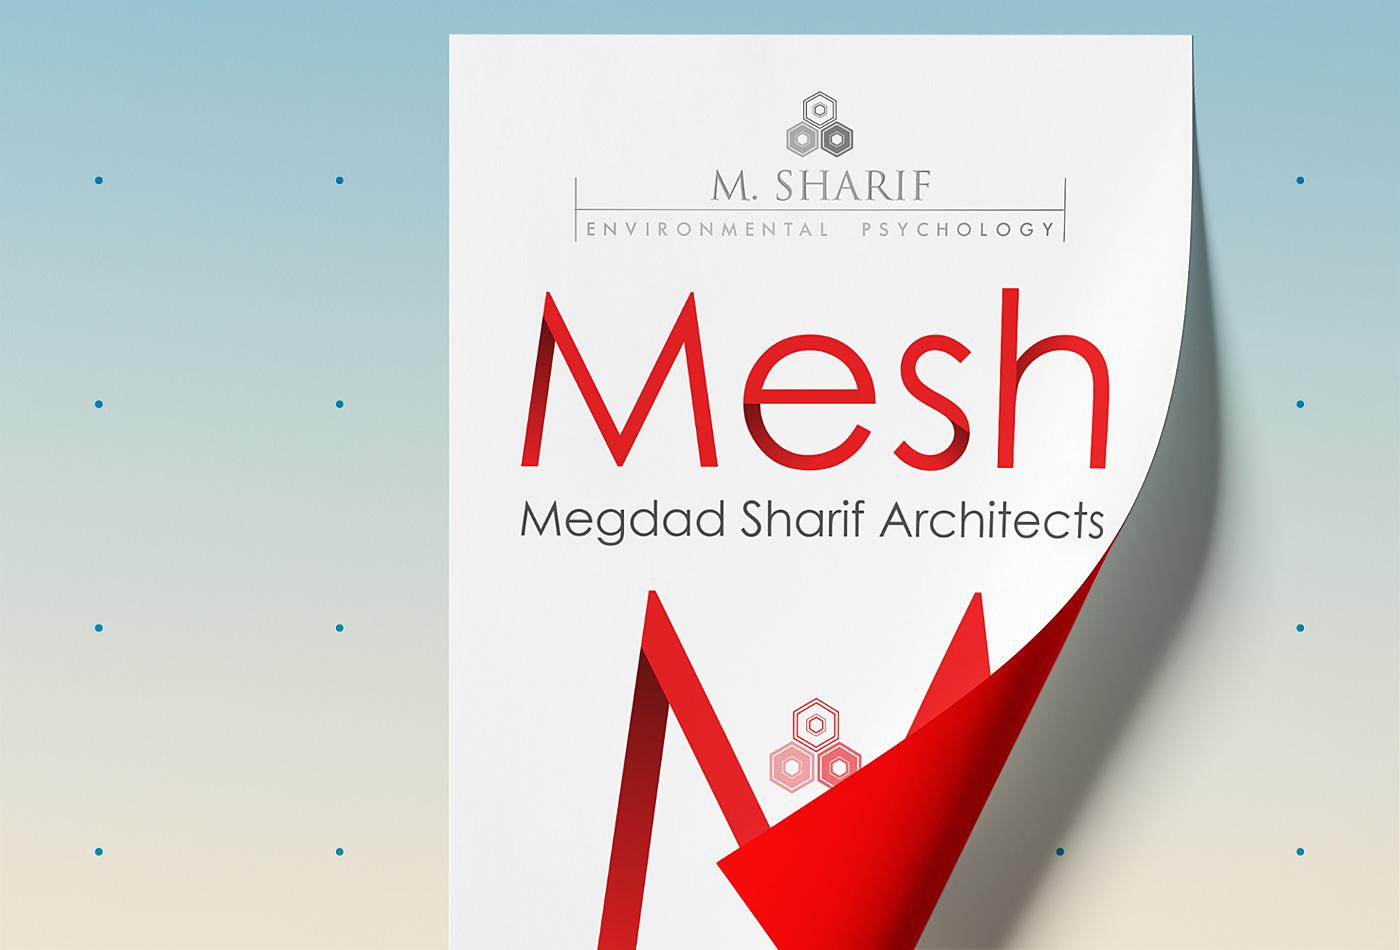 01-Mesh Corporate Identity